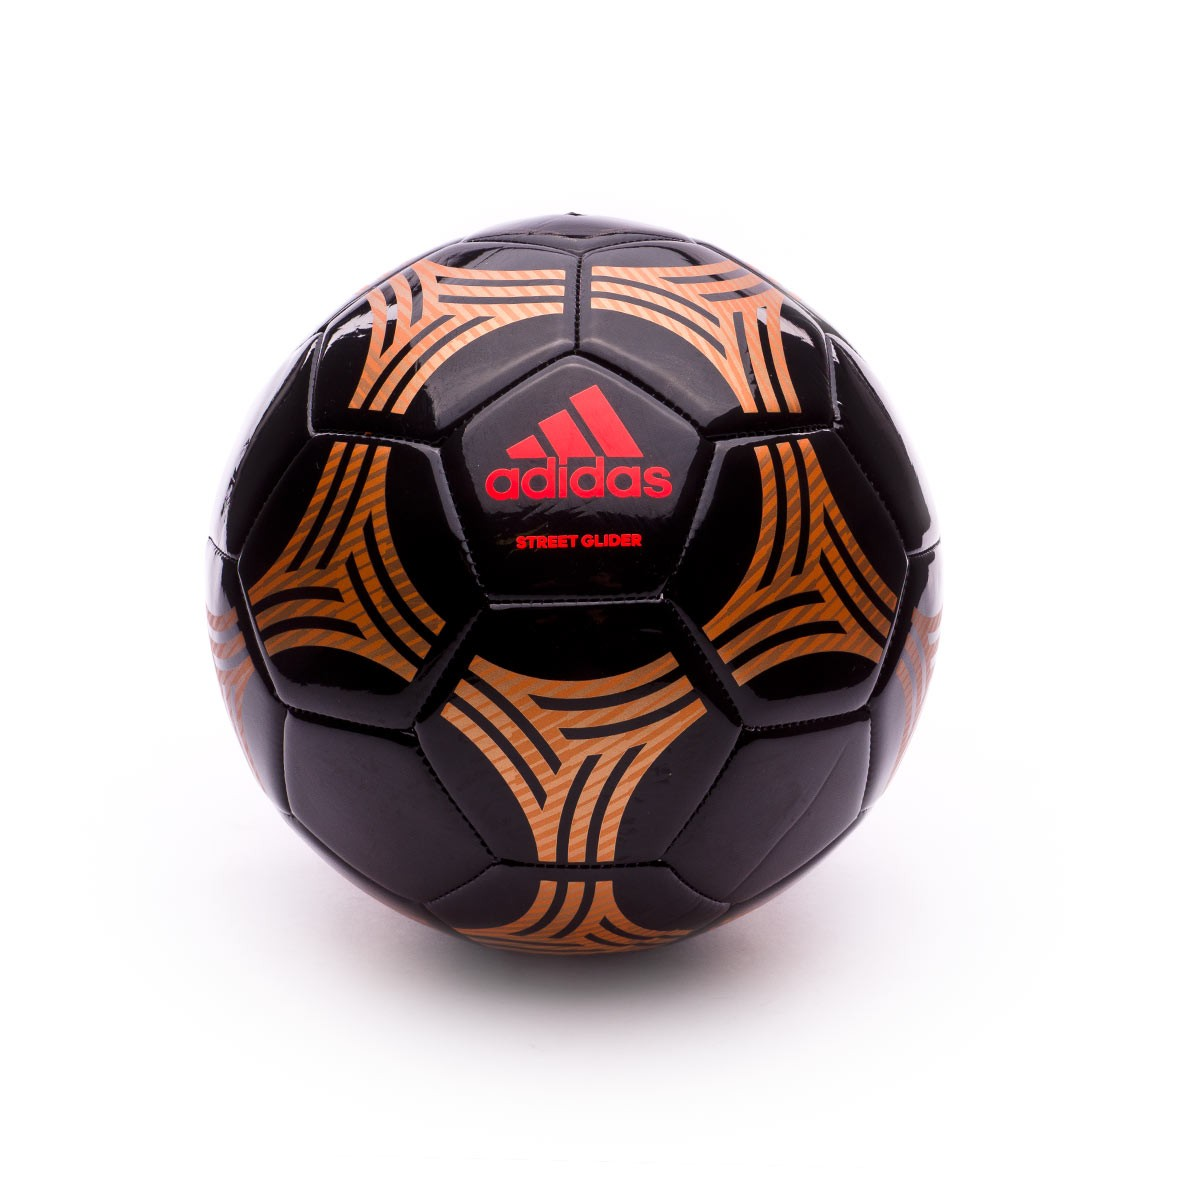 Ball adidas Tango Street Glider Black-Gold-Solar red - Football ... e73f74abfd860